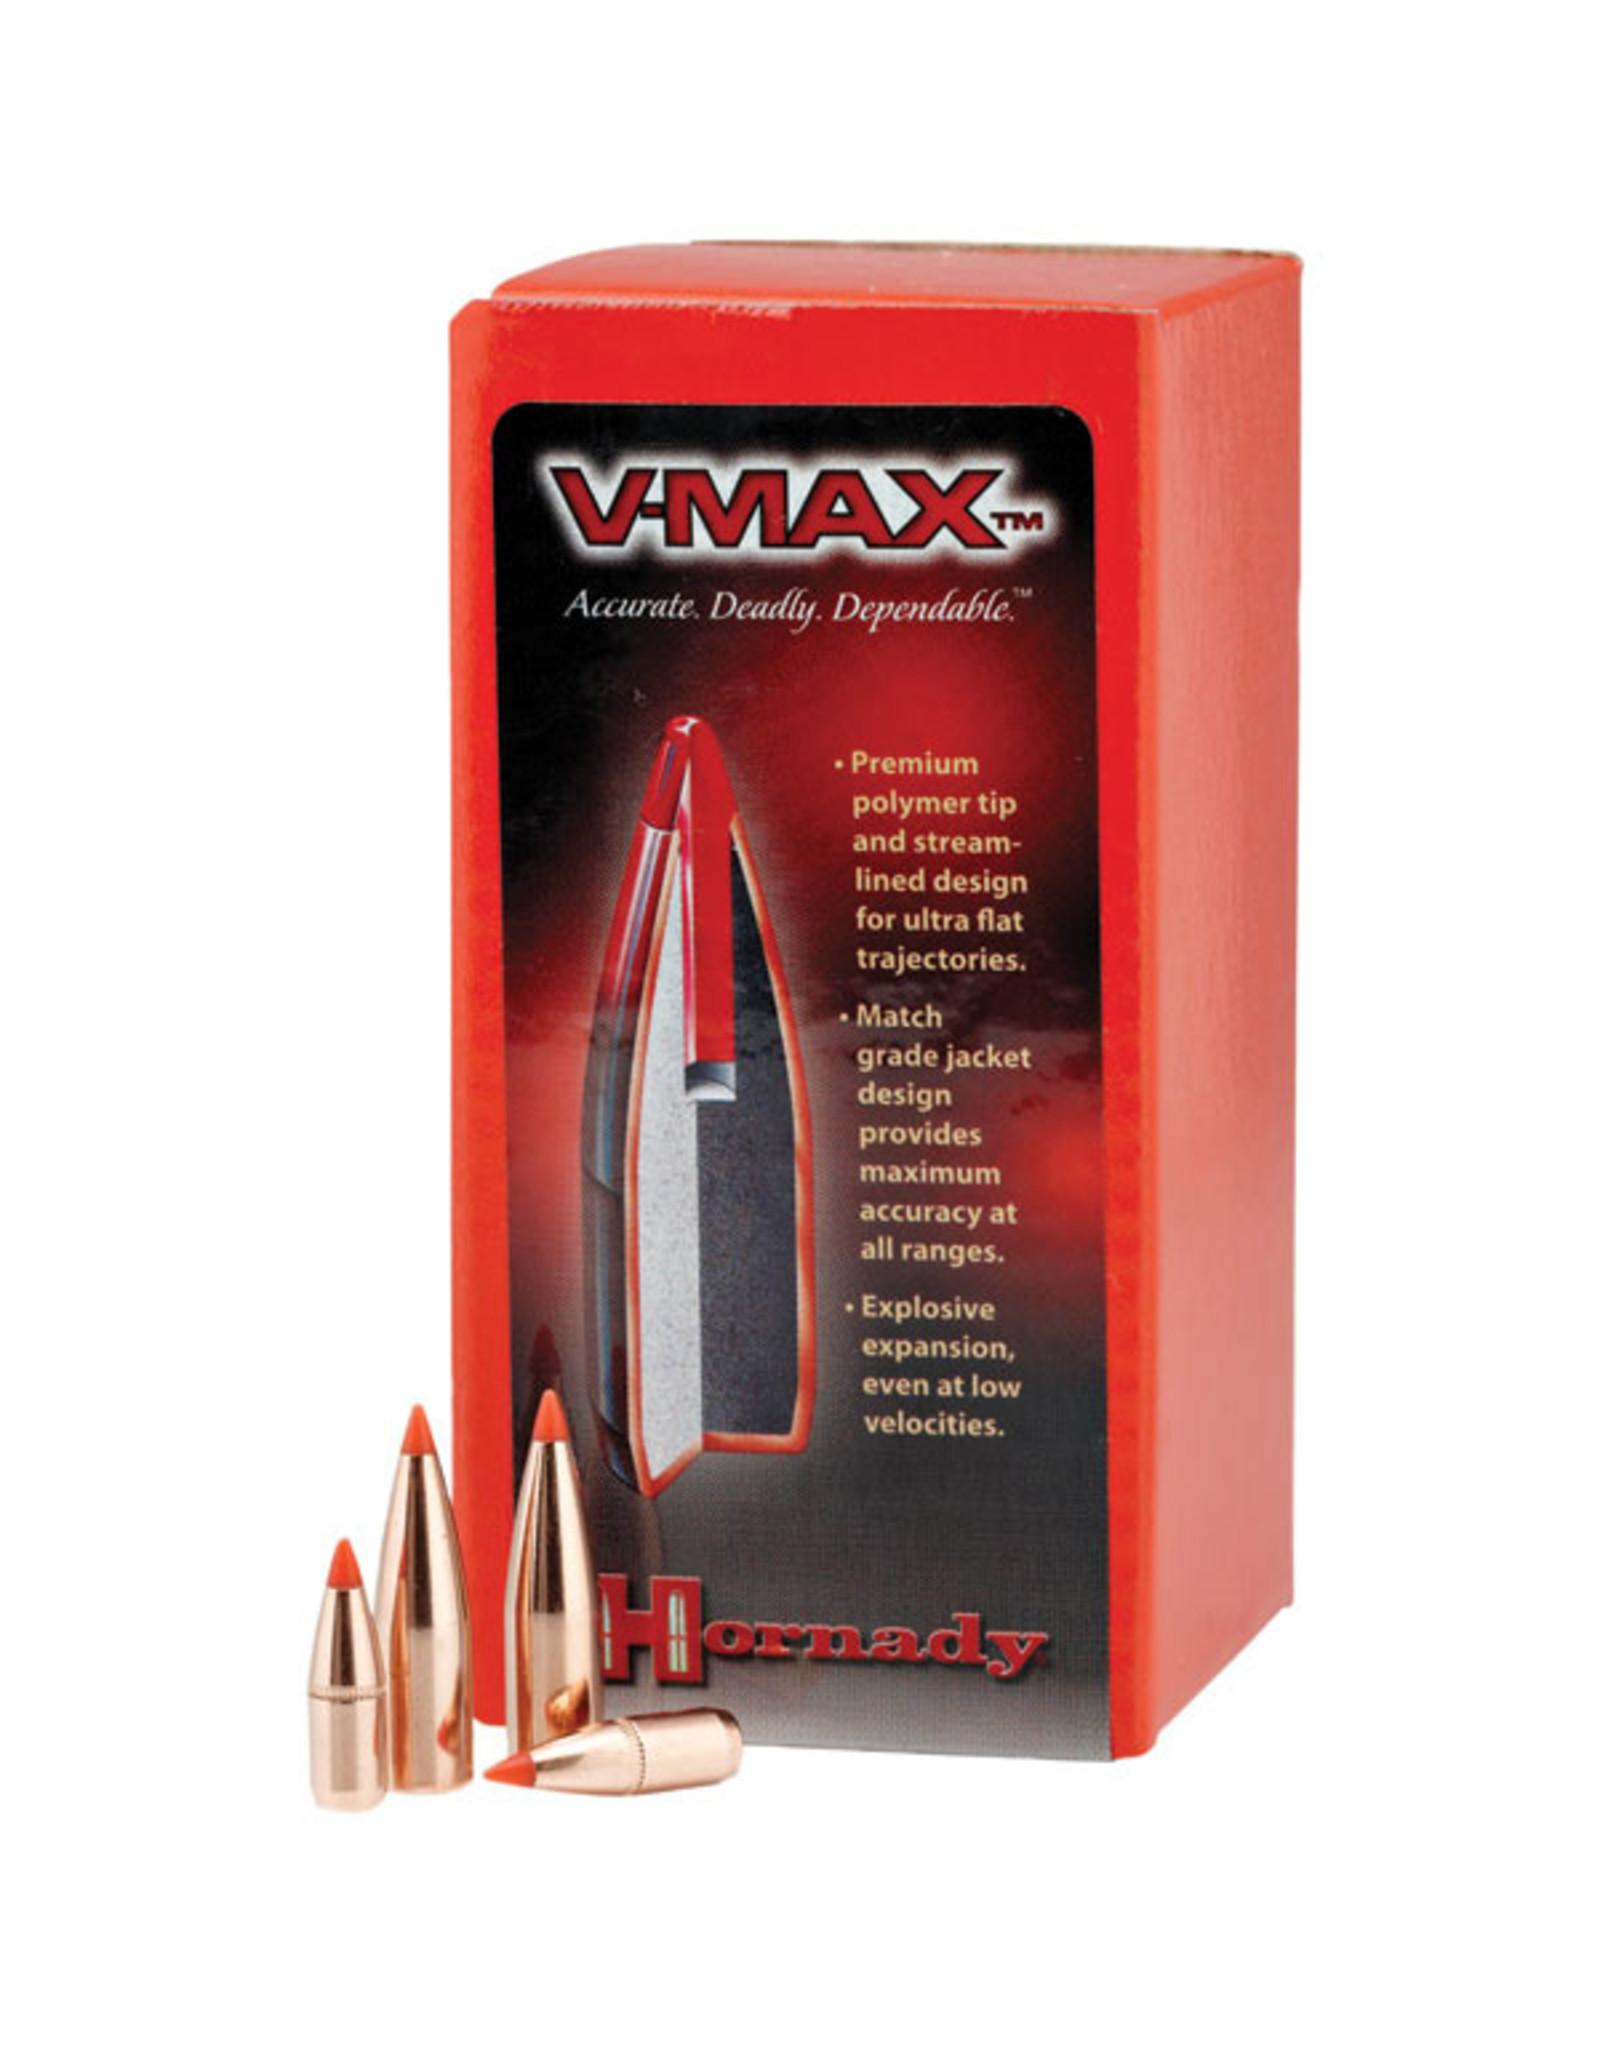 Hornady 17 CAL .172 20 GR V-MAX